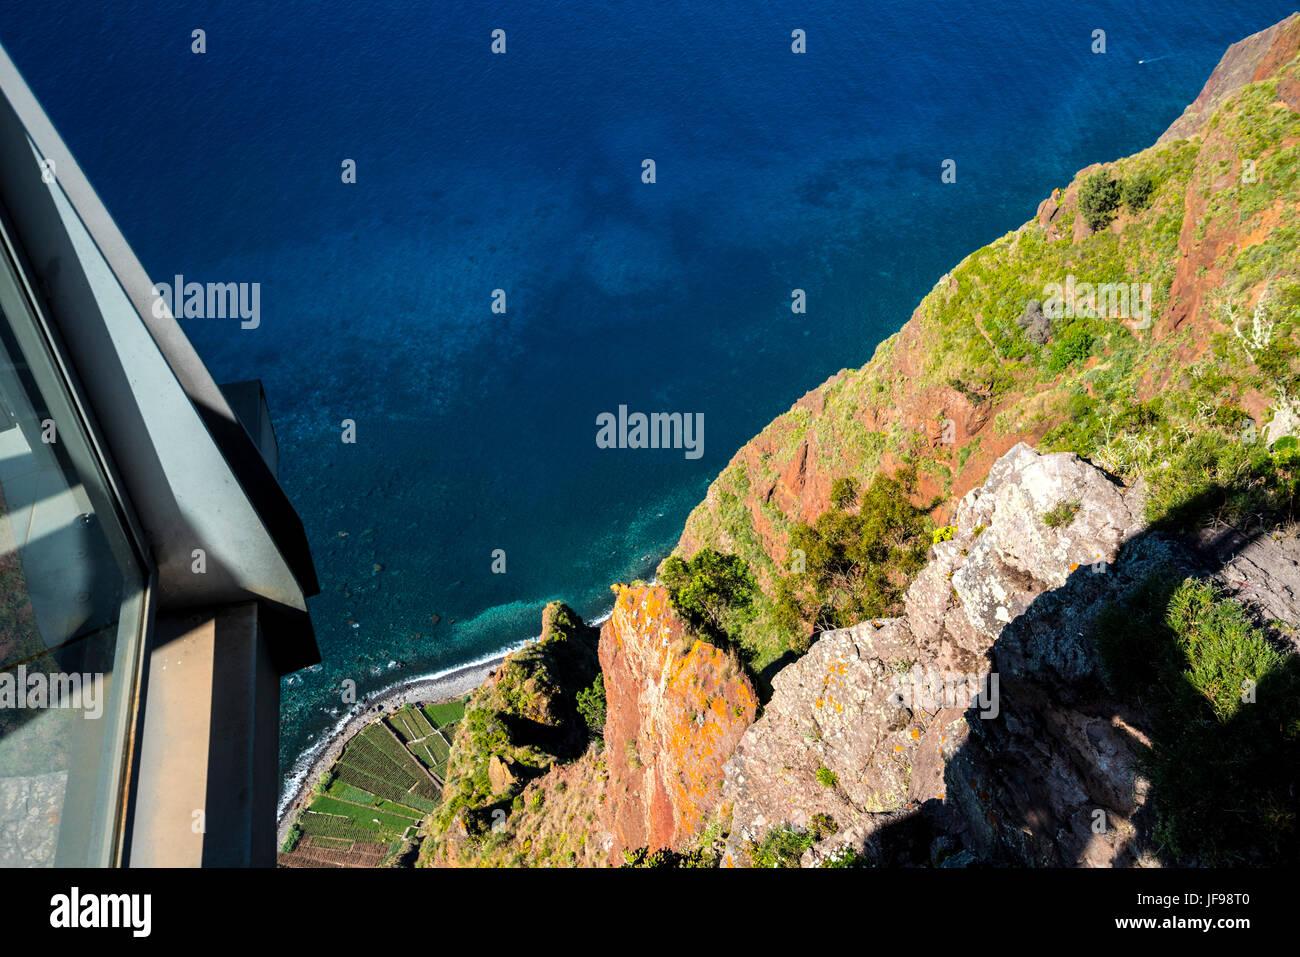 Glass Floored Stockfotos & Glass Floored Bilder - Alamy